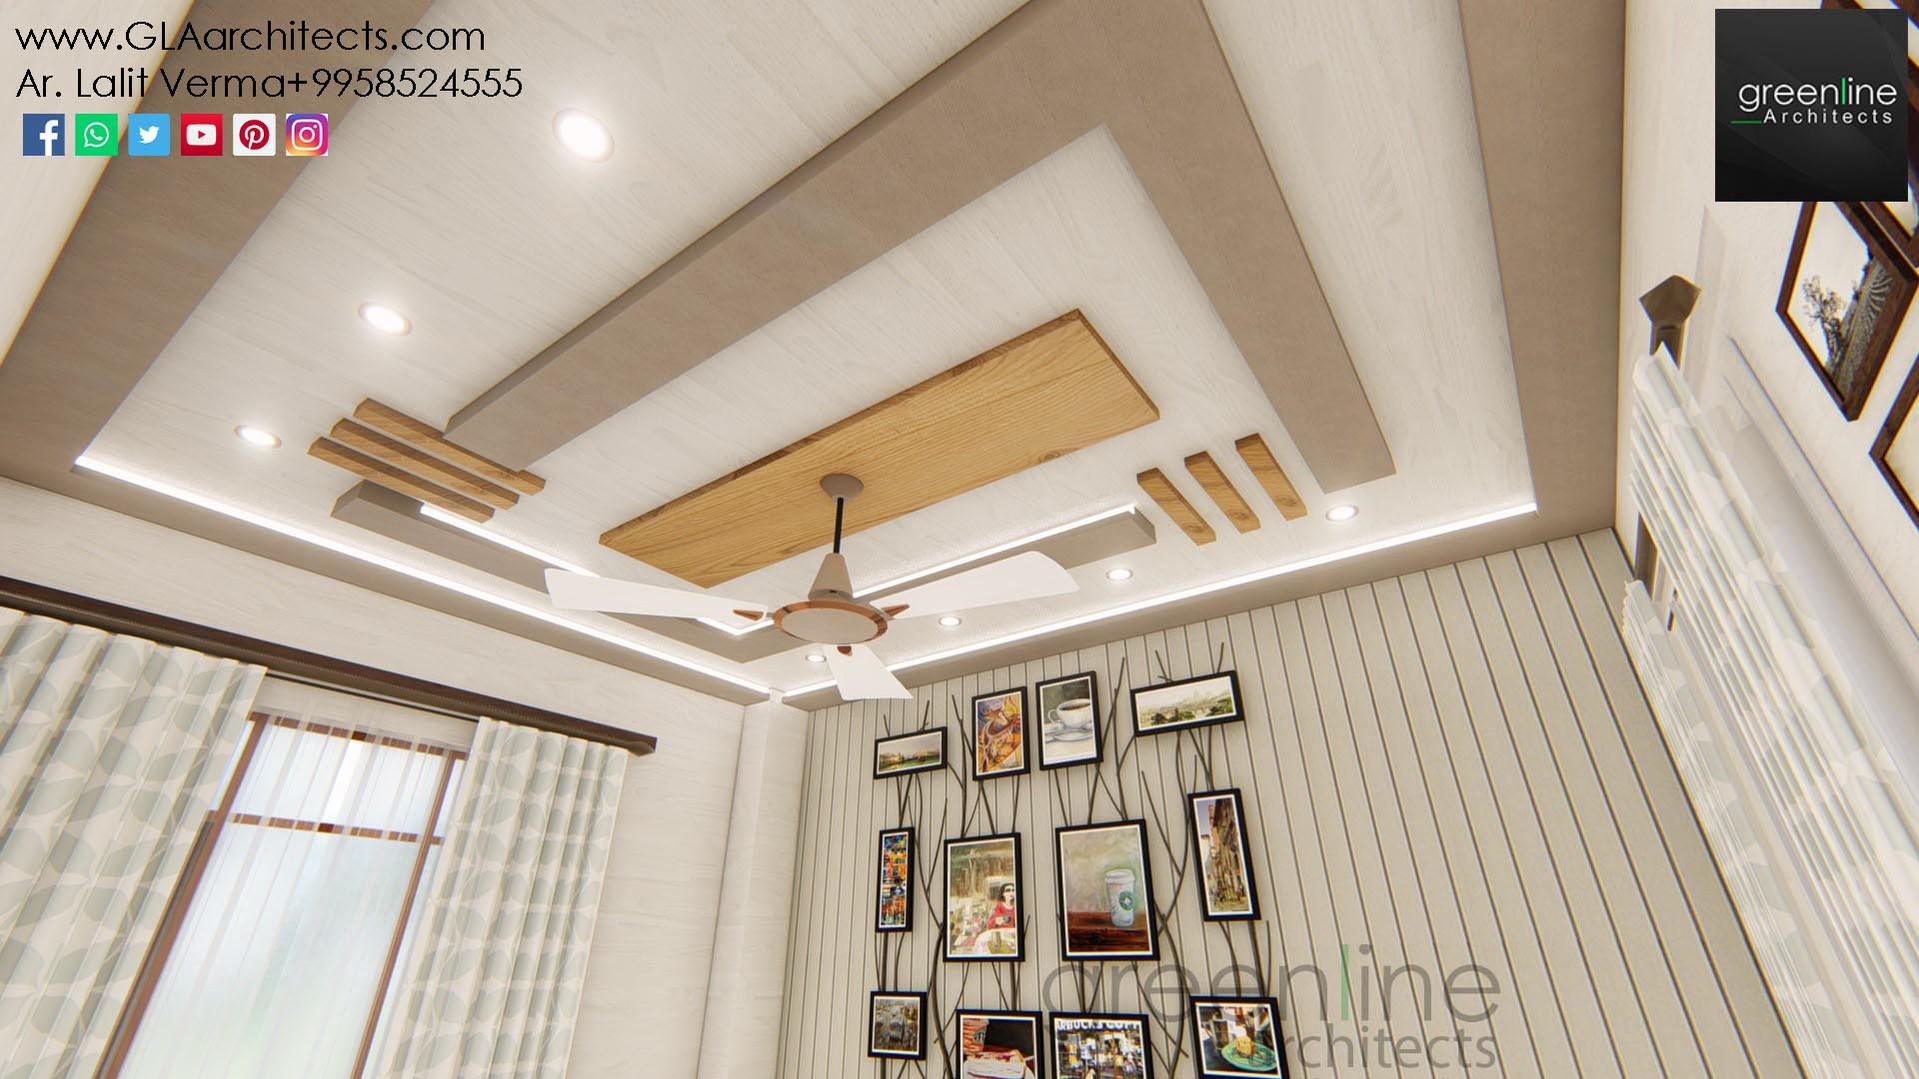 3 BHK-Apartment_Home Interior (3).jpg